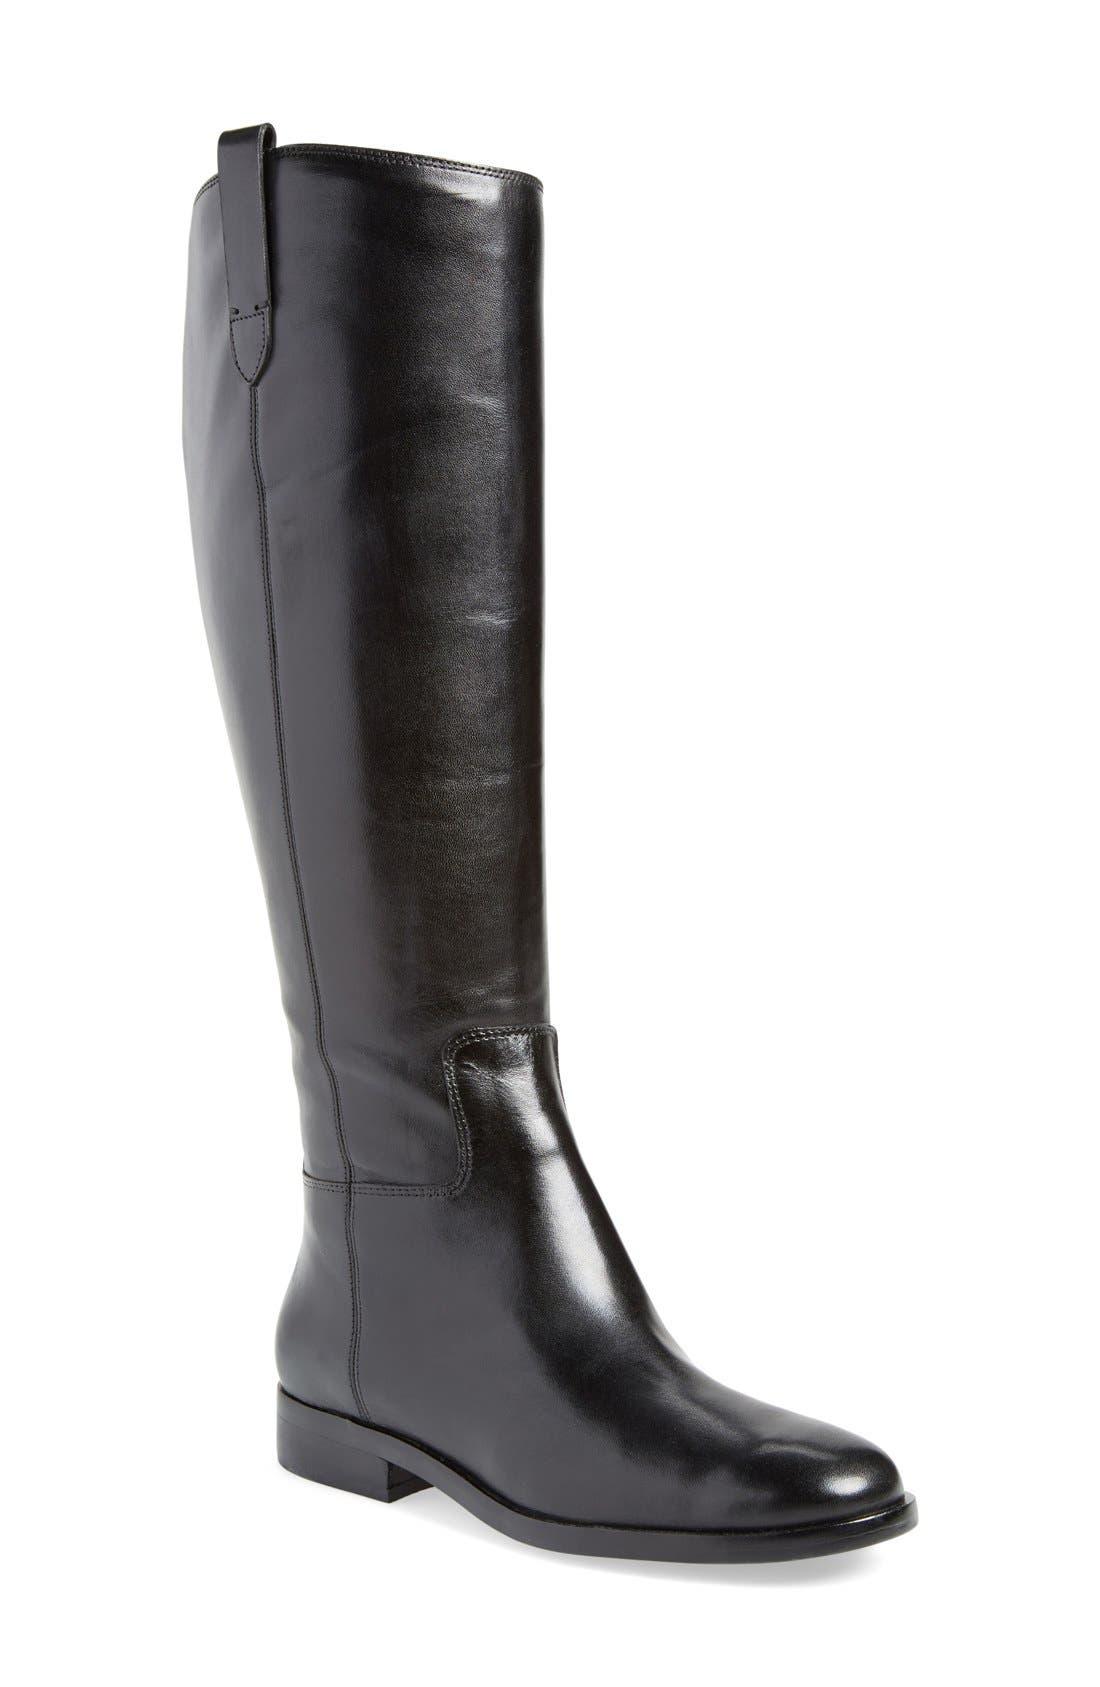 Main Image - Ivanka Trump 'Addee' Tall Riding Boot (Women)